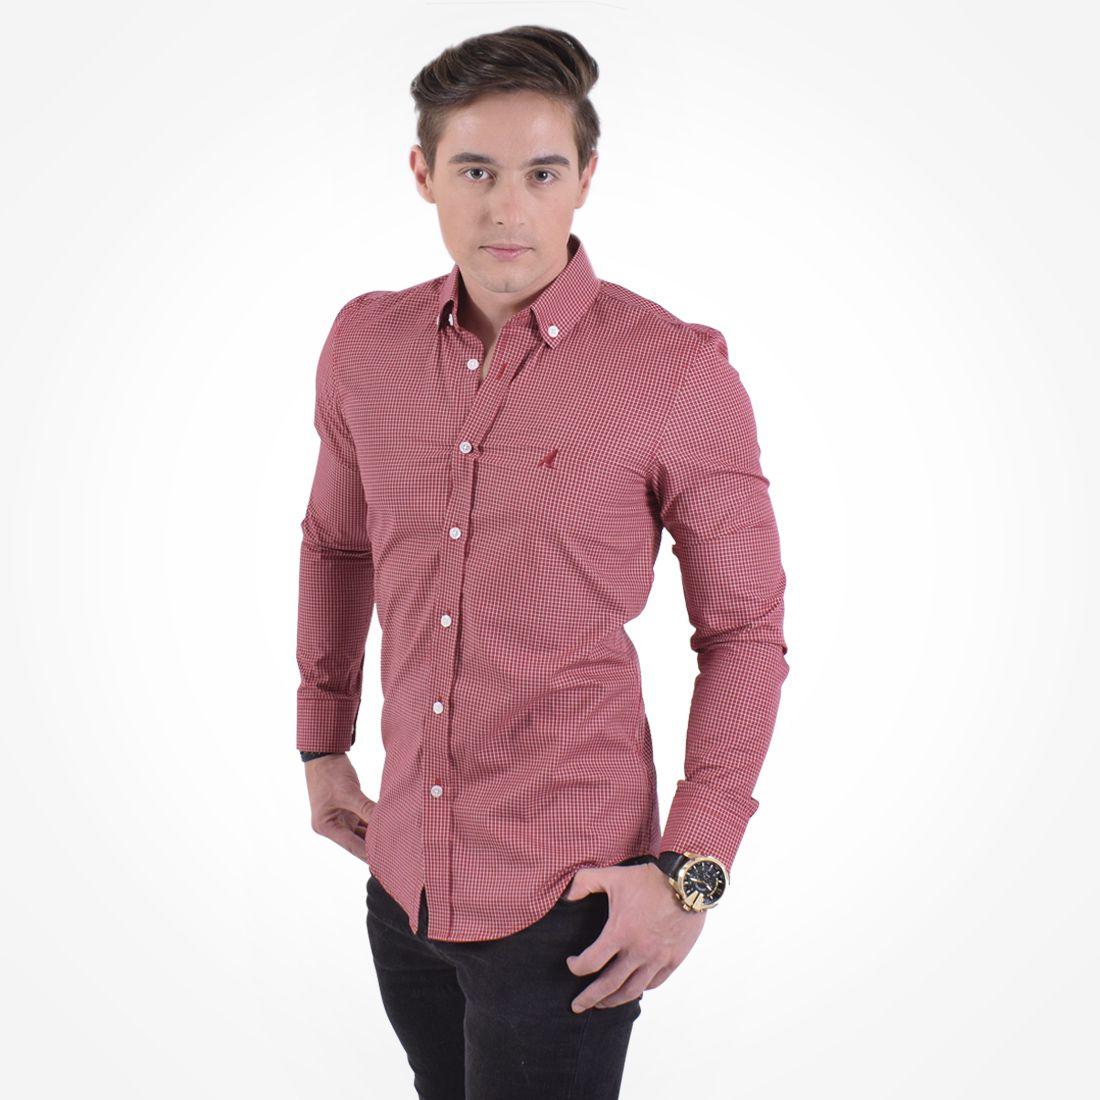 100223 - Camisa Xadrez Masculina Slim Social Vermelha - LEVOK